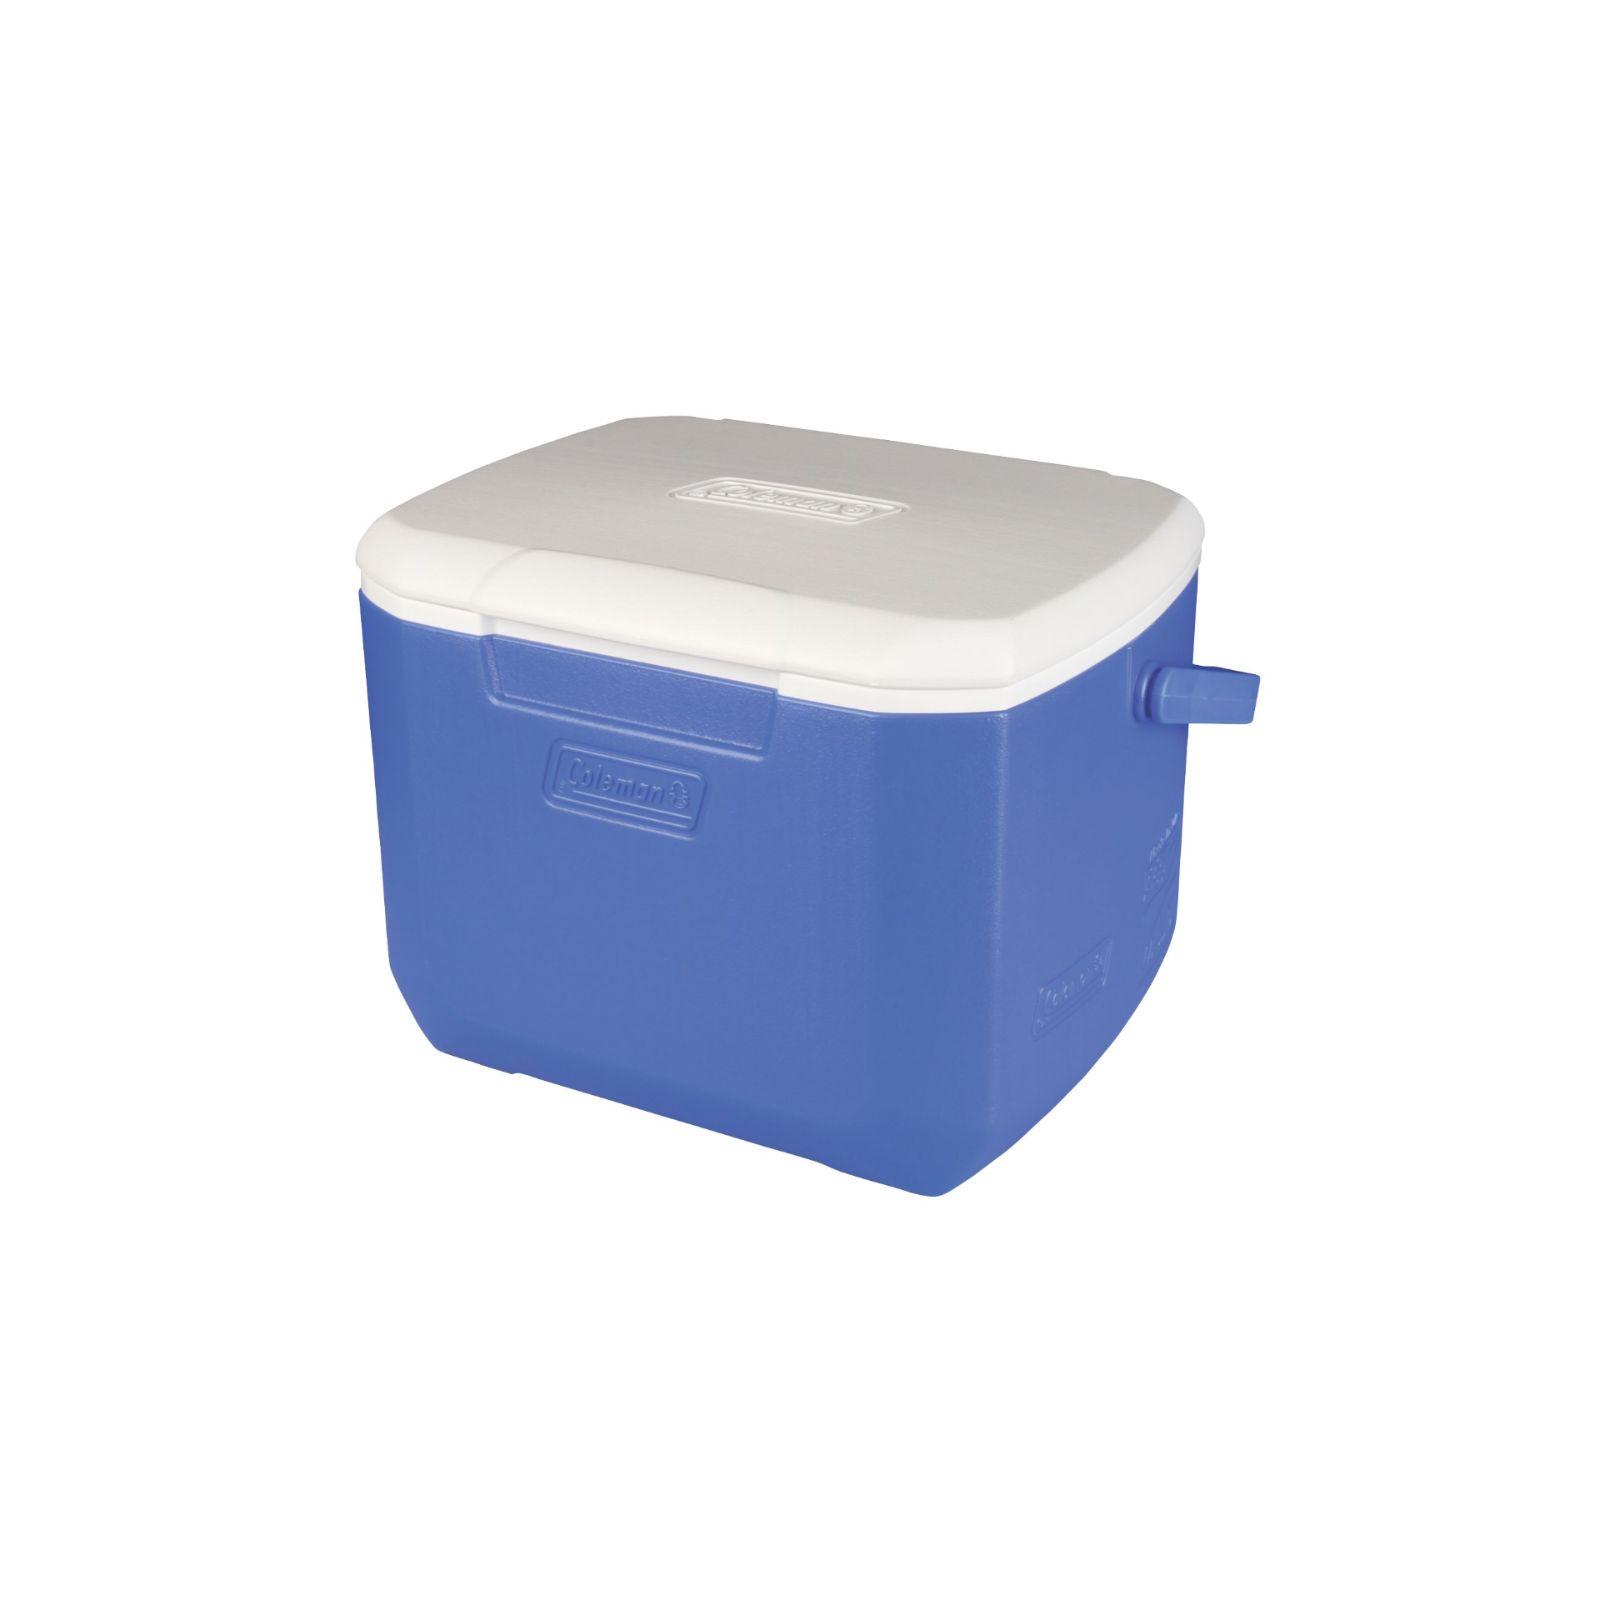 Coleman Cooler 16Qt Blue 00 5877 C004